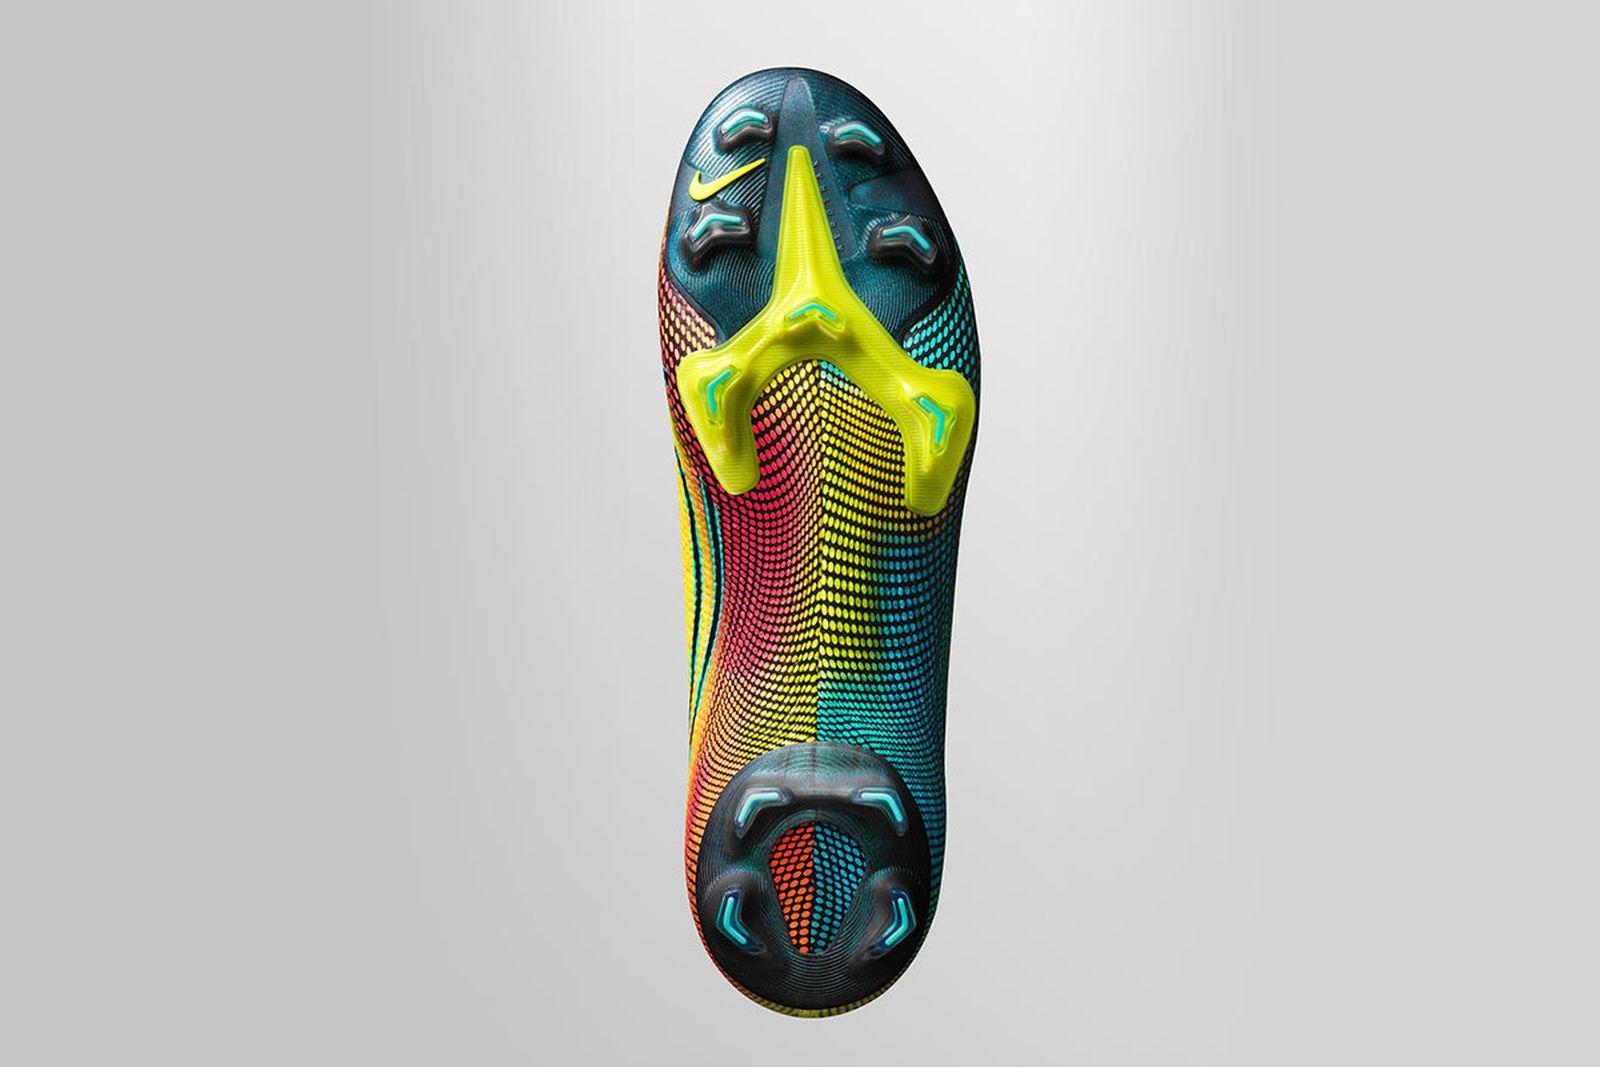 nike-mercurial-dream-speed-2-release-date-price-02